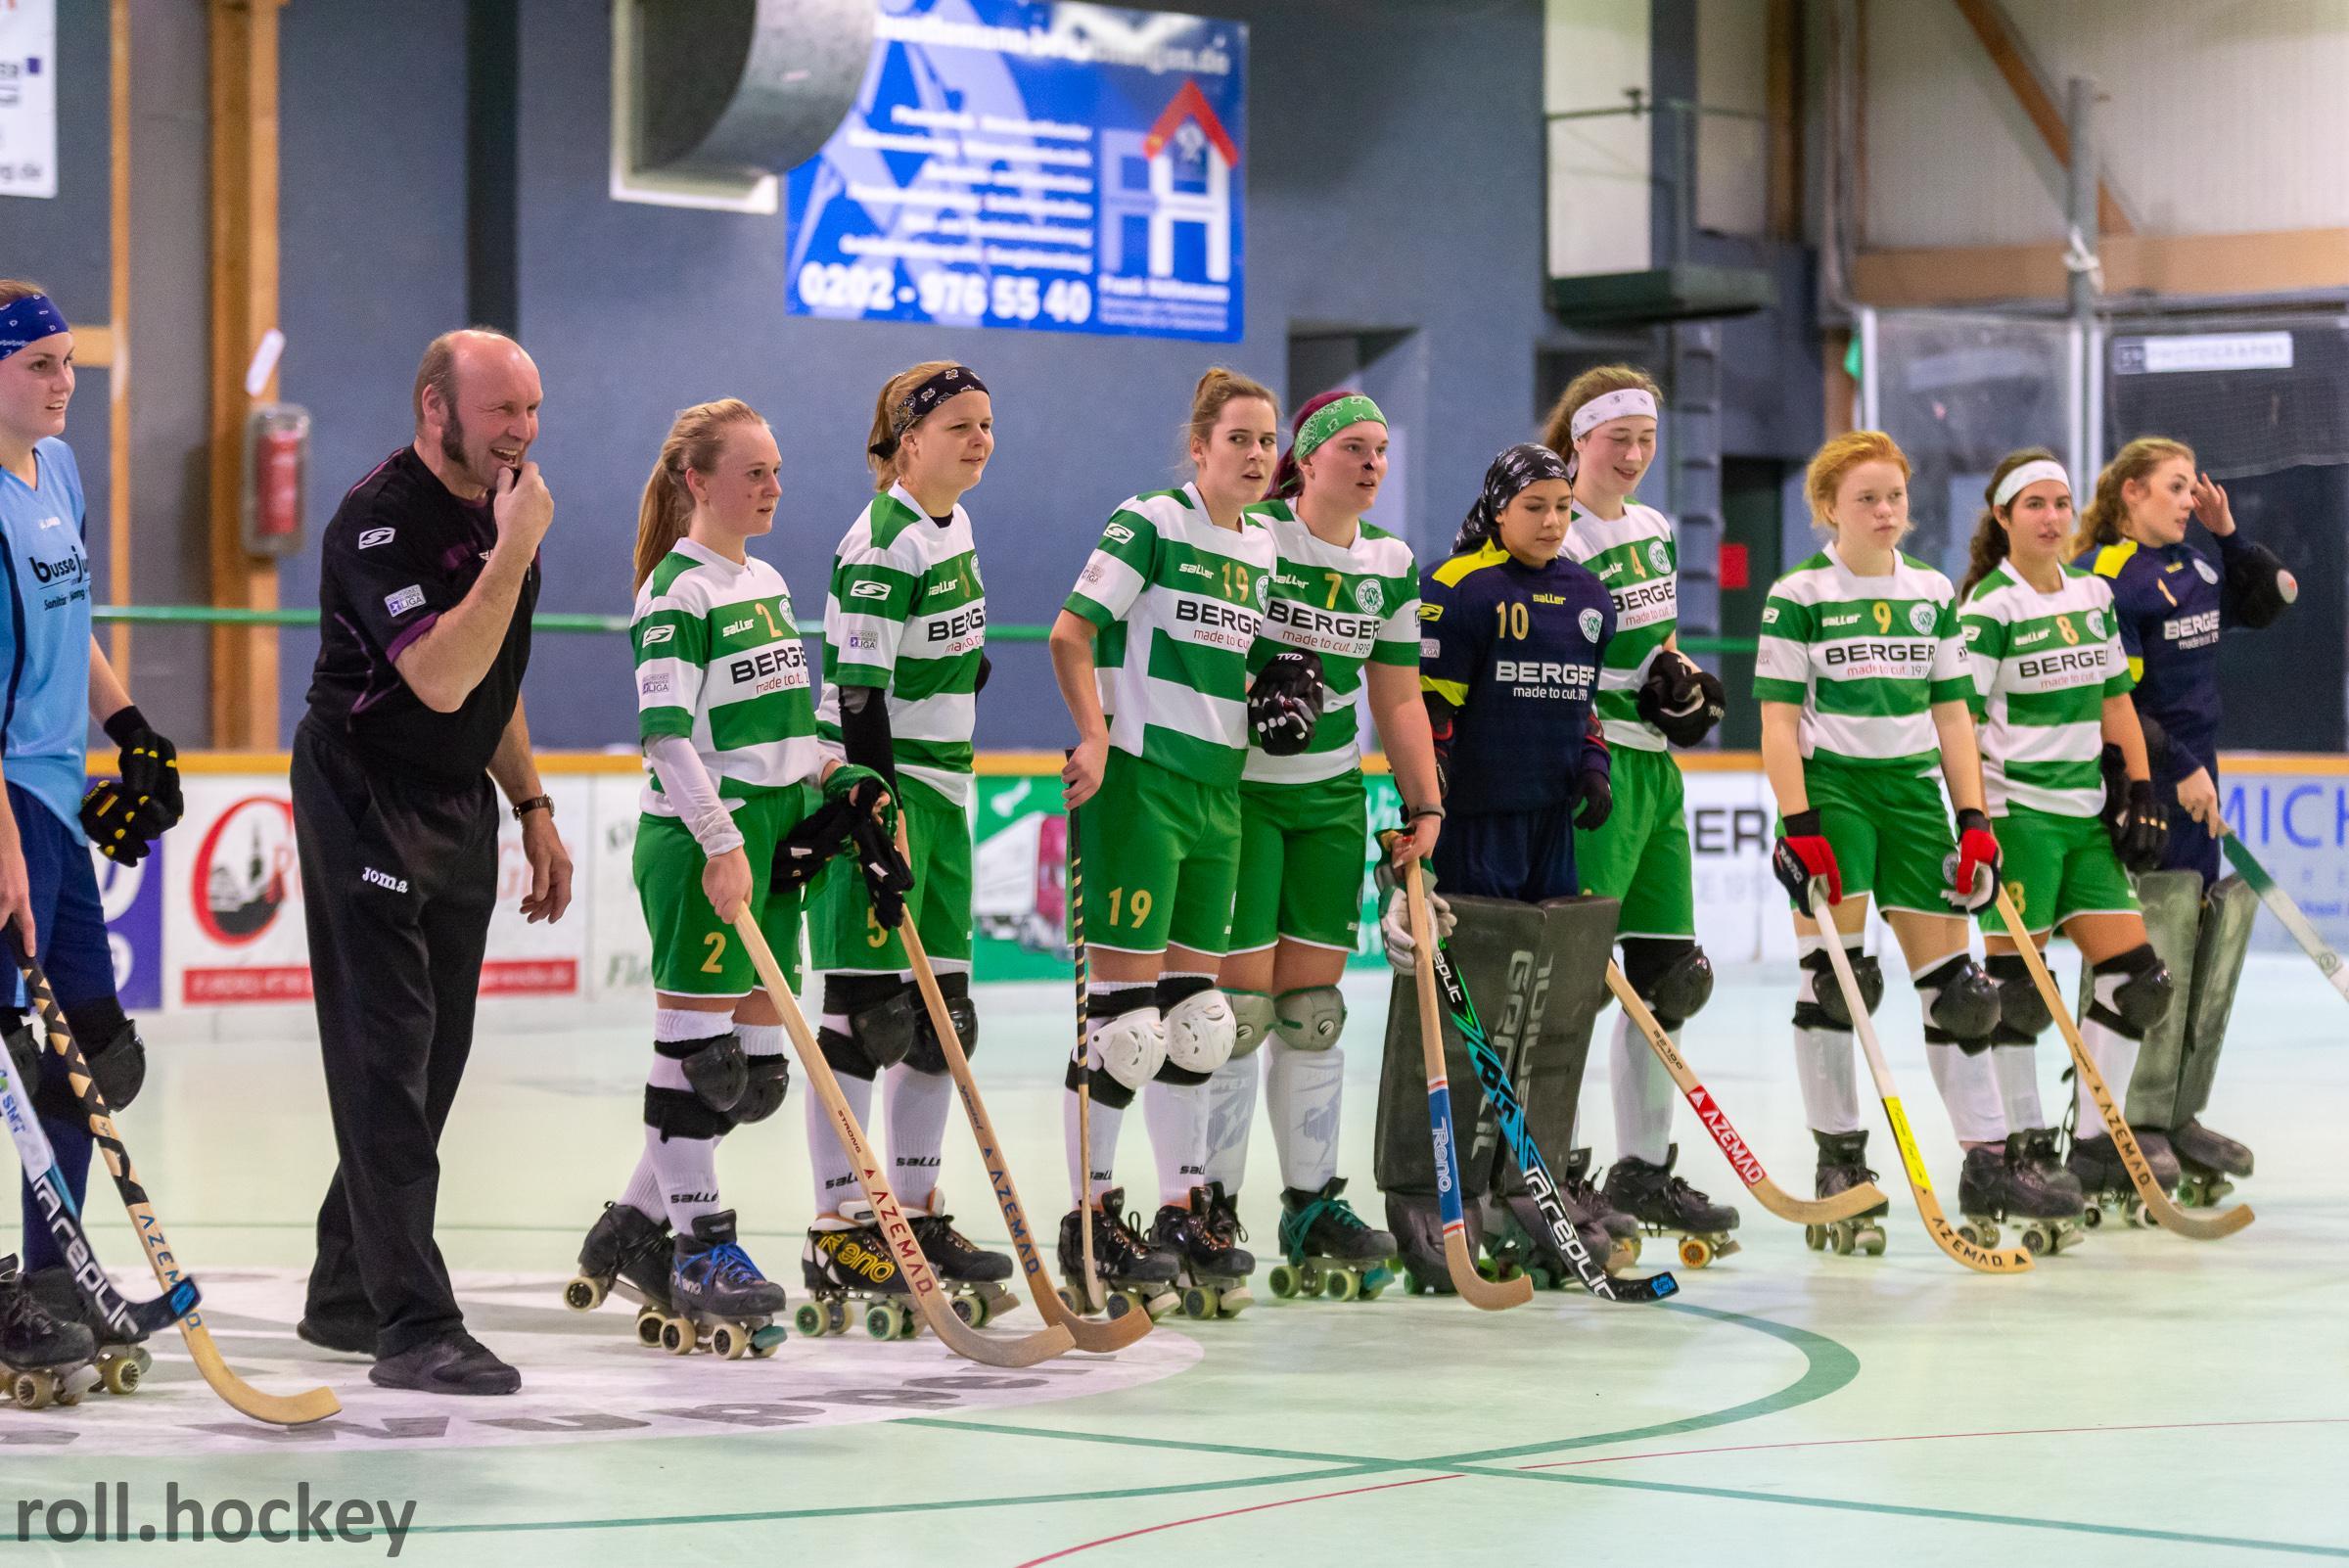 RSC Cronenberg Rollhockey Bundesliga Damen Spieltag 24.11.2018